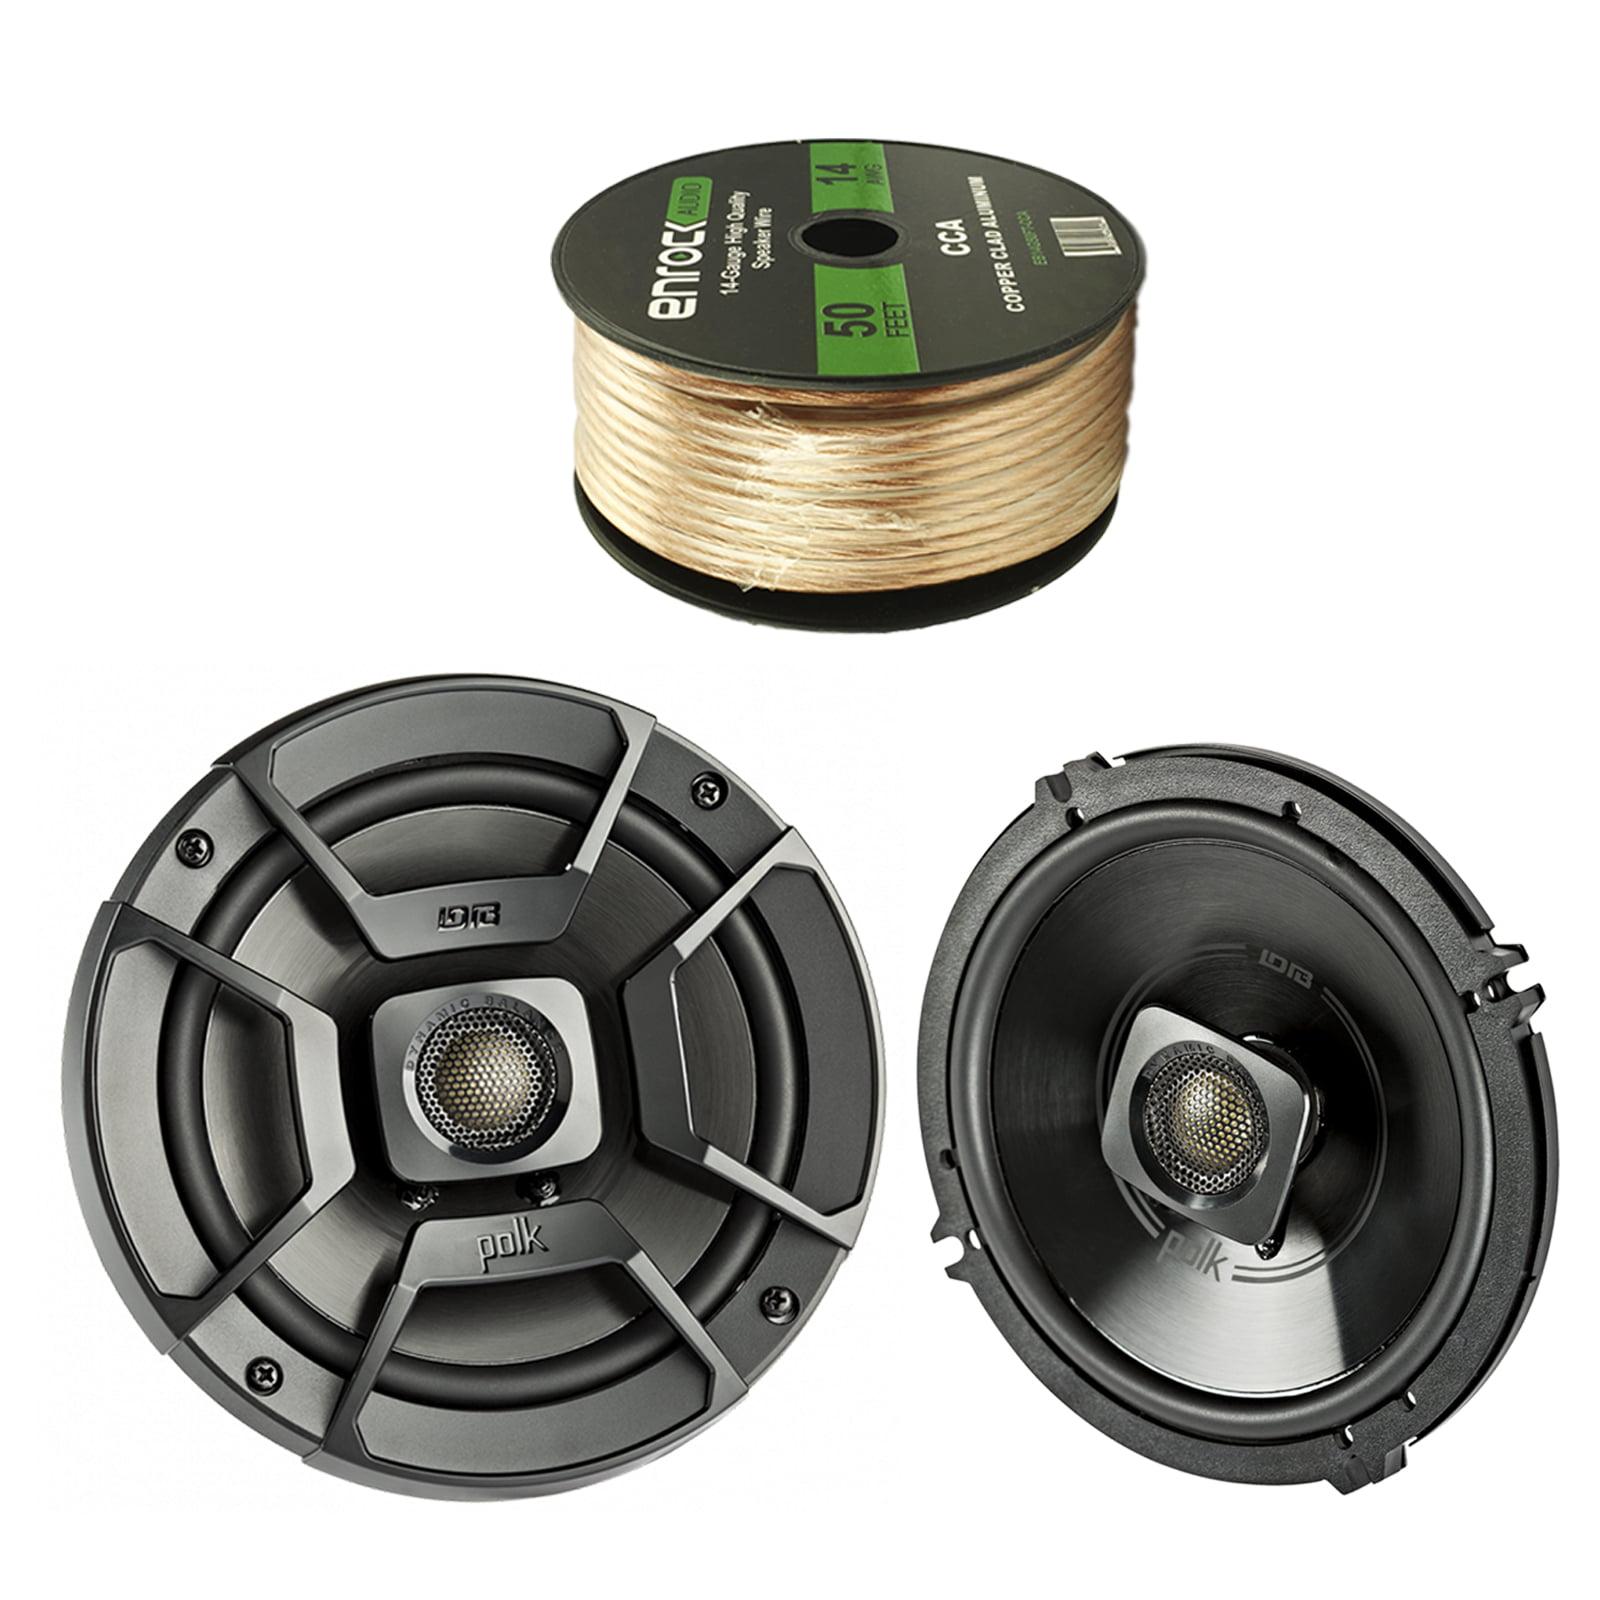 "2X Polk Audio 6.5"" 300W 2 Way Car/Marine ATV Stereo Coaxial Speakers, Enrock Audio 14 AWG Gauge 50 Feet Speaker Wire Cable"